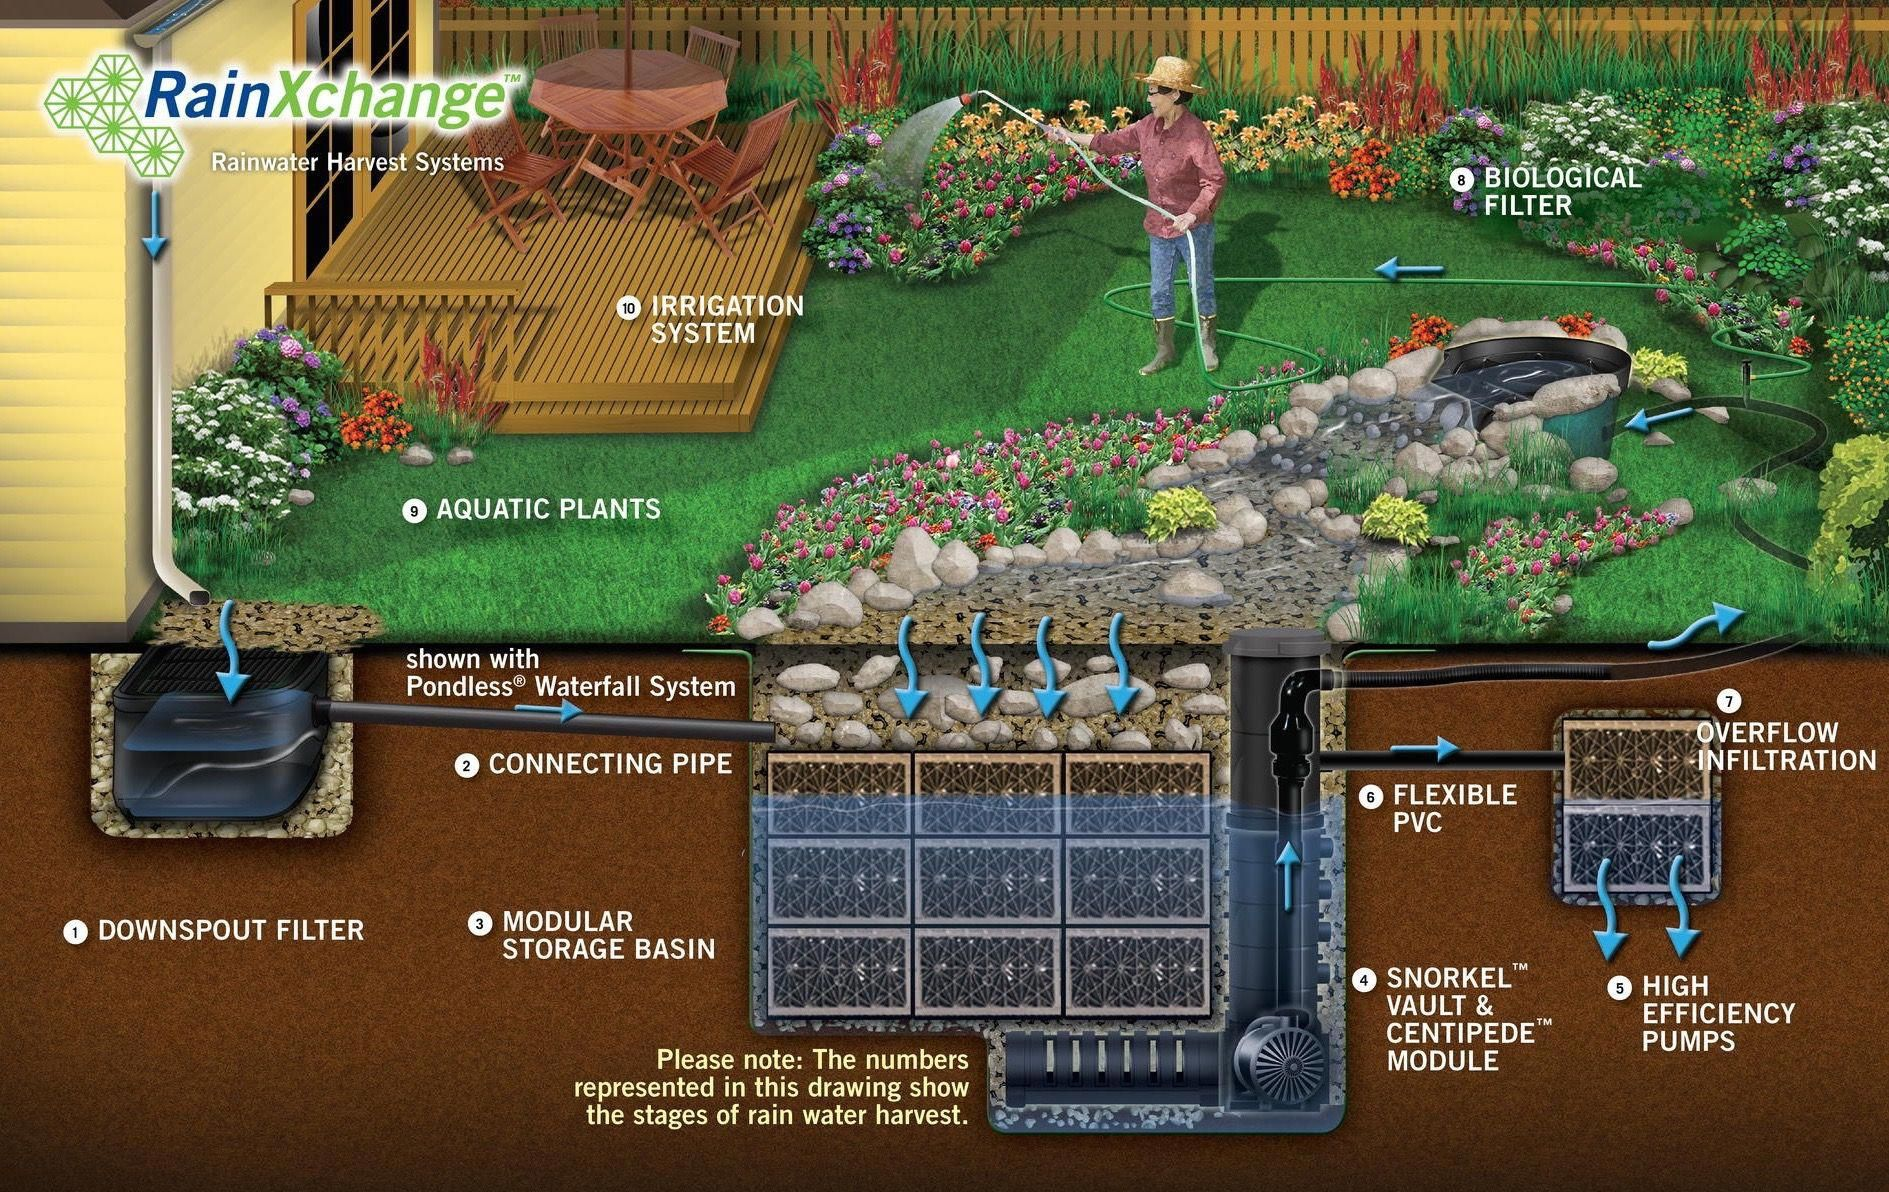 Pin by 상호 이 on 인테리어도구 아이디어 in 2020 Rainwater harvesting